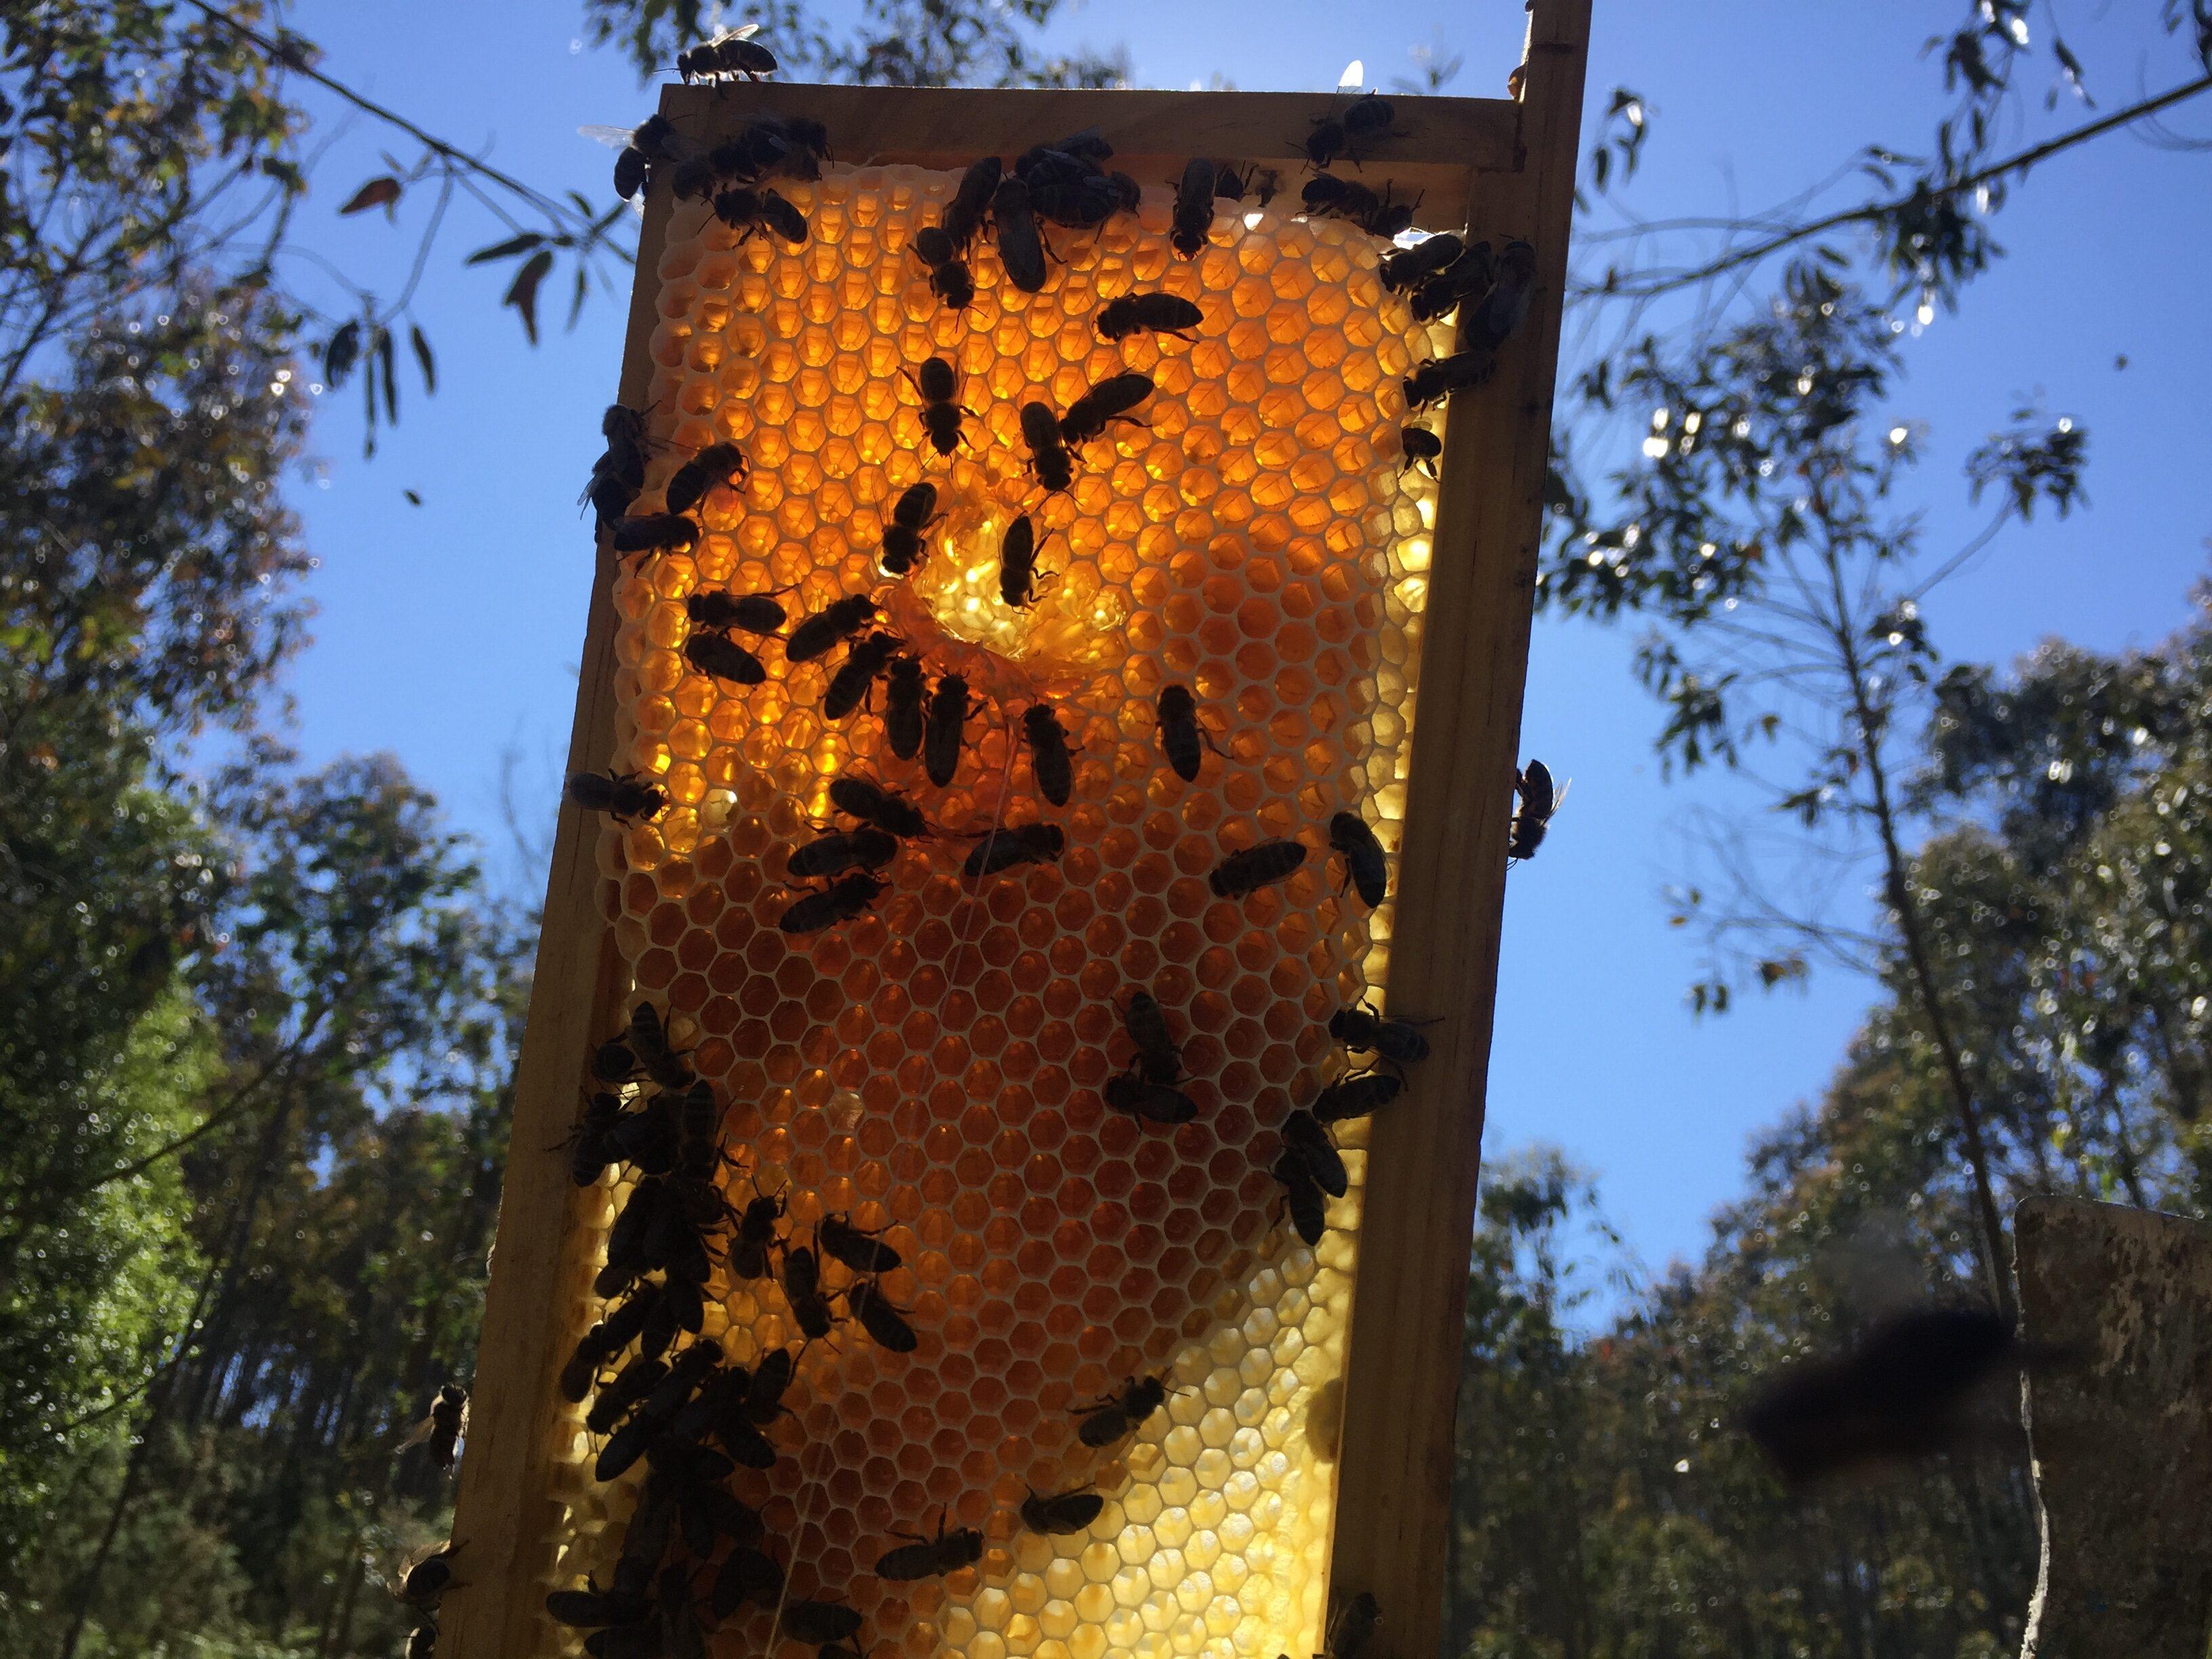 Abejas recolectando miel de primavera